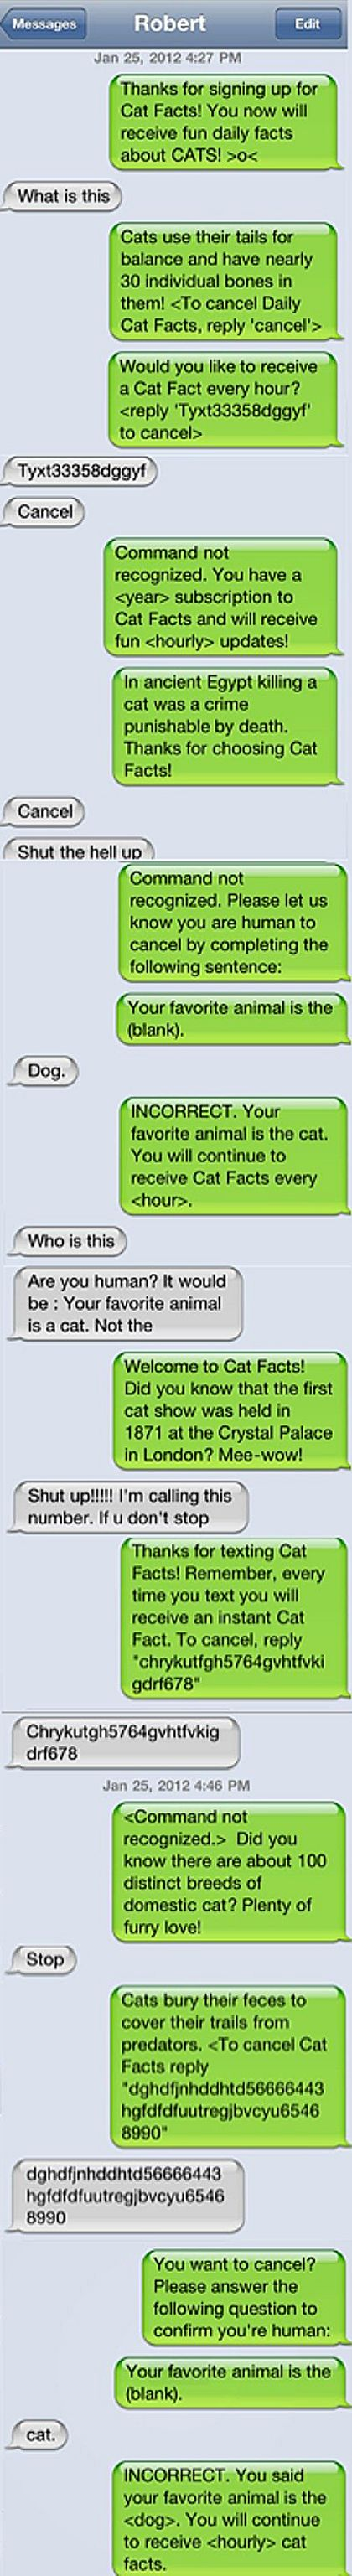 masterful cat facts texting prank fυииу pinterest texting